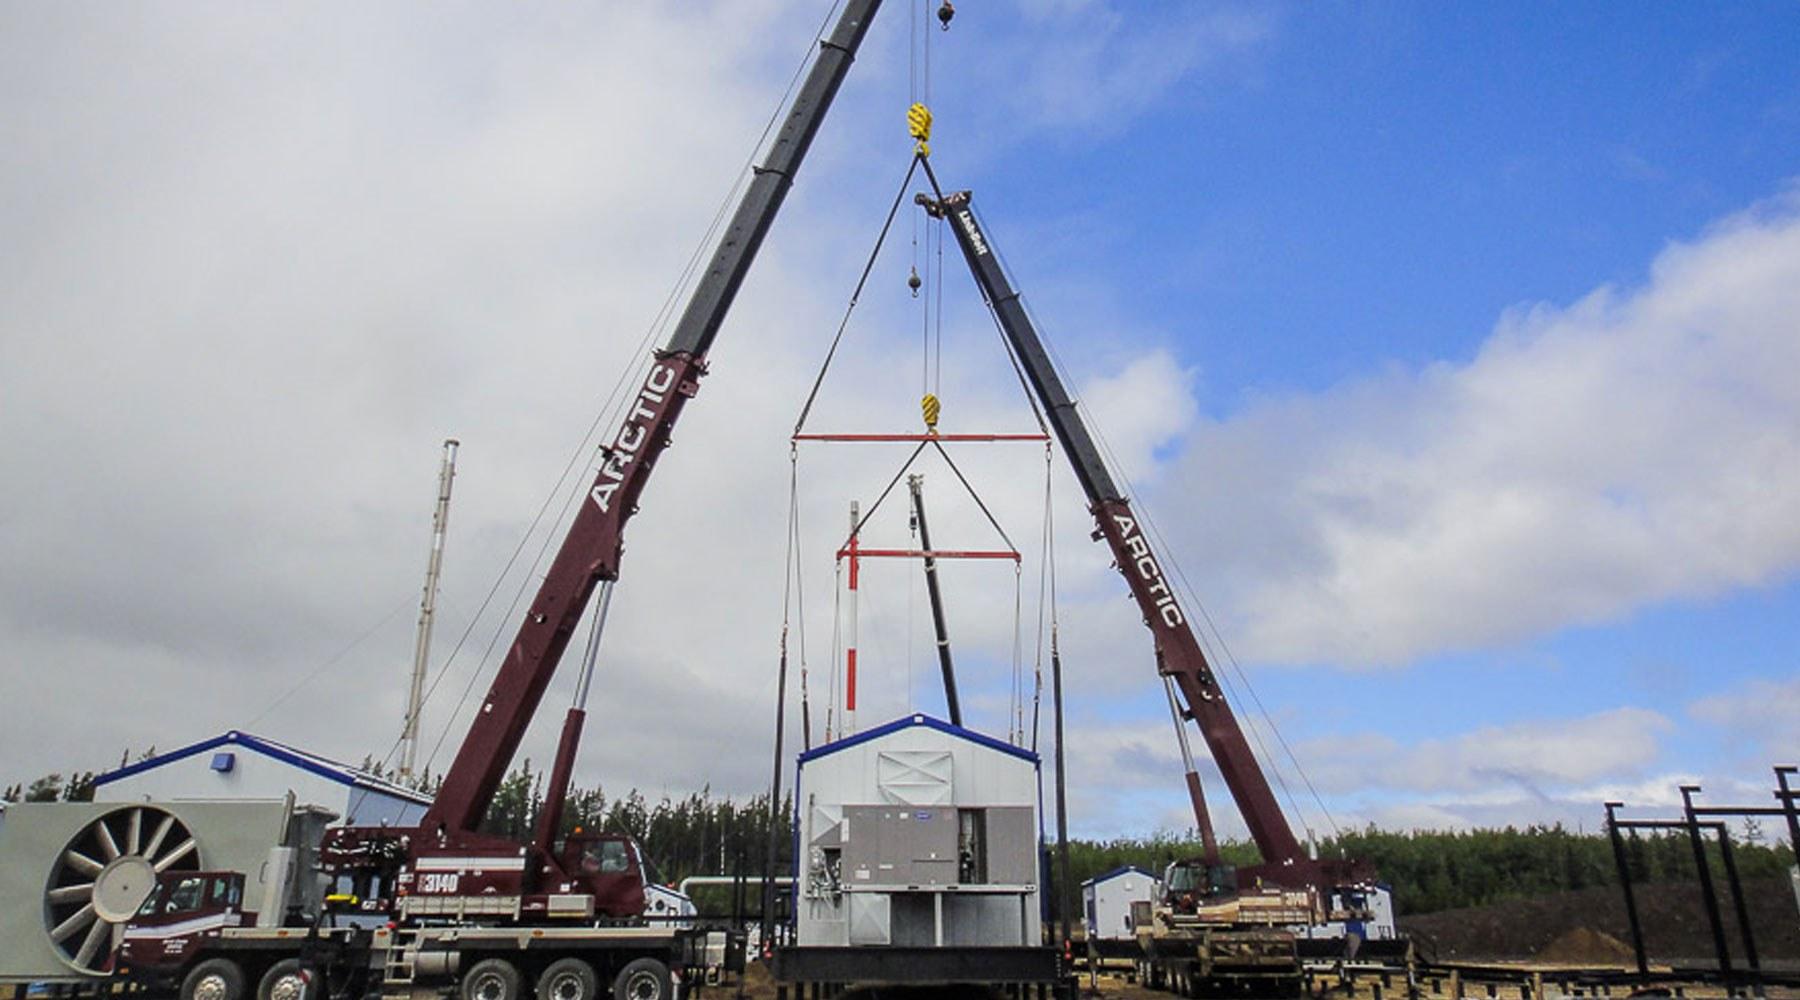 Cranes hoisting an accommodation unit